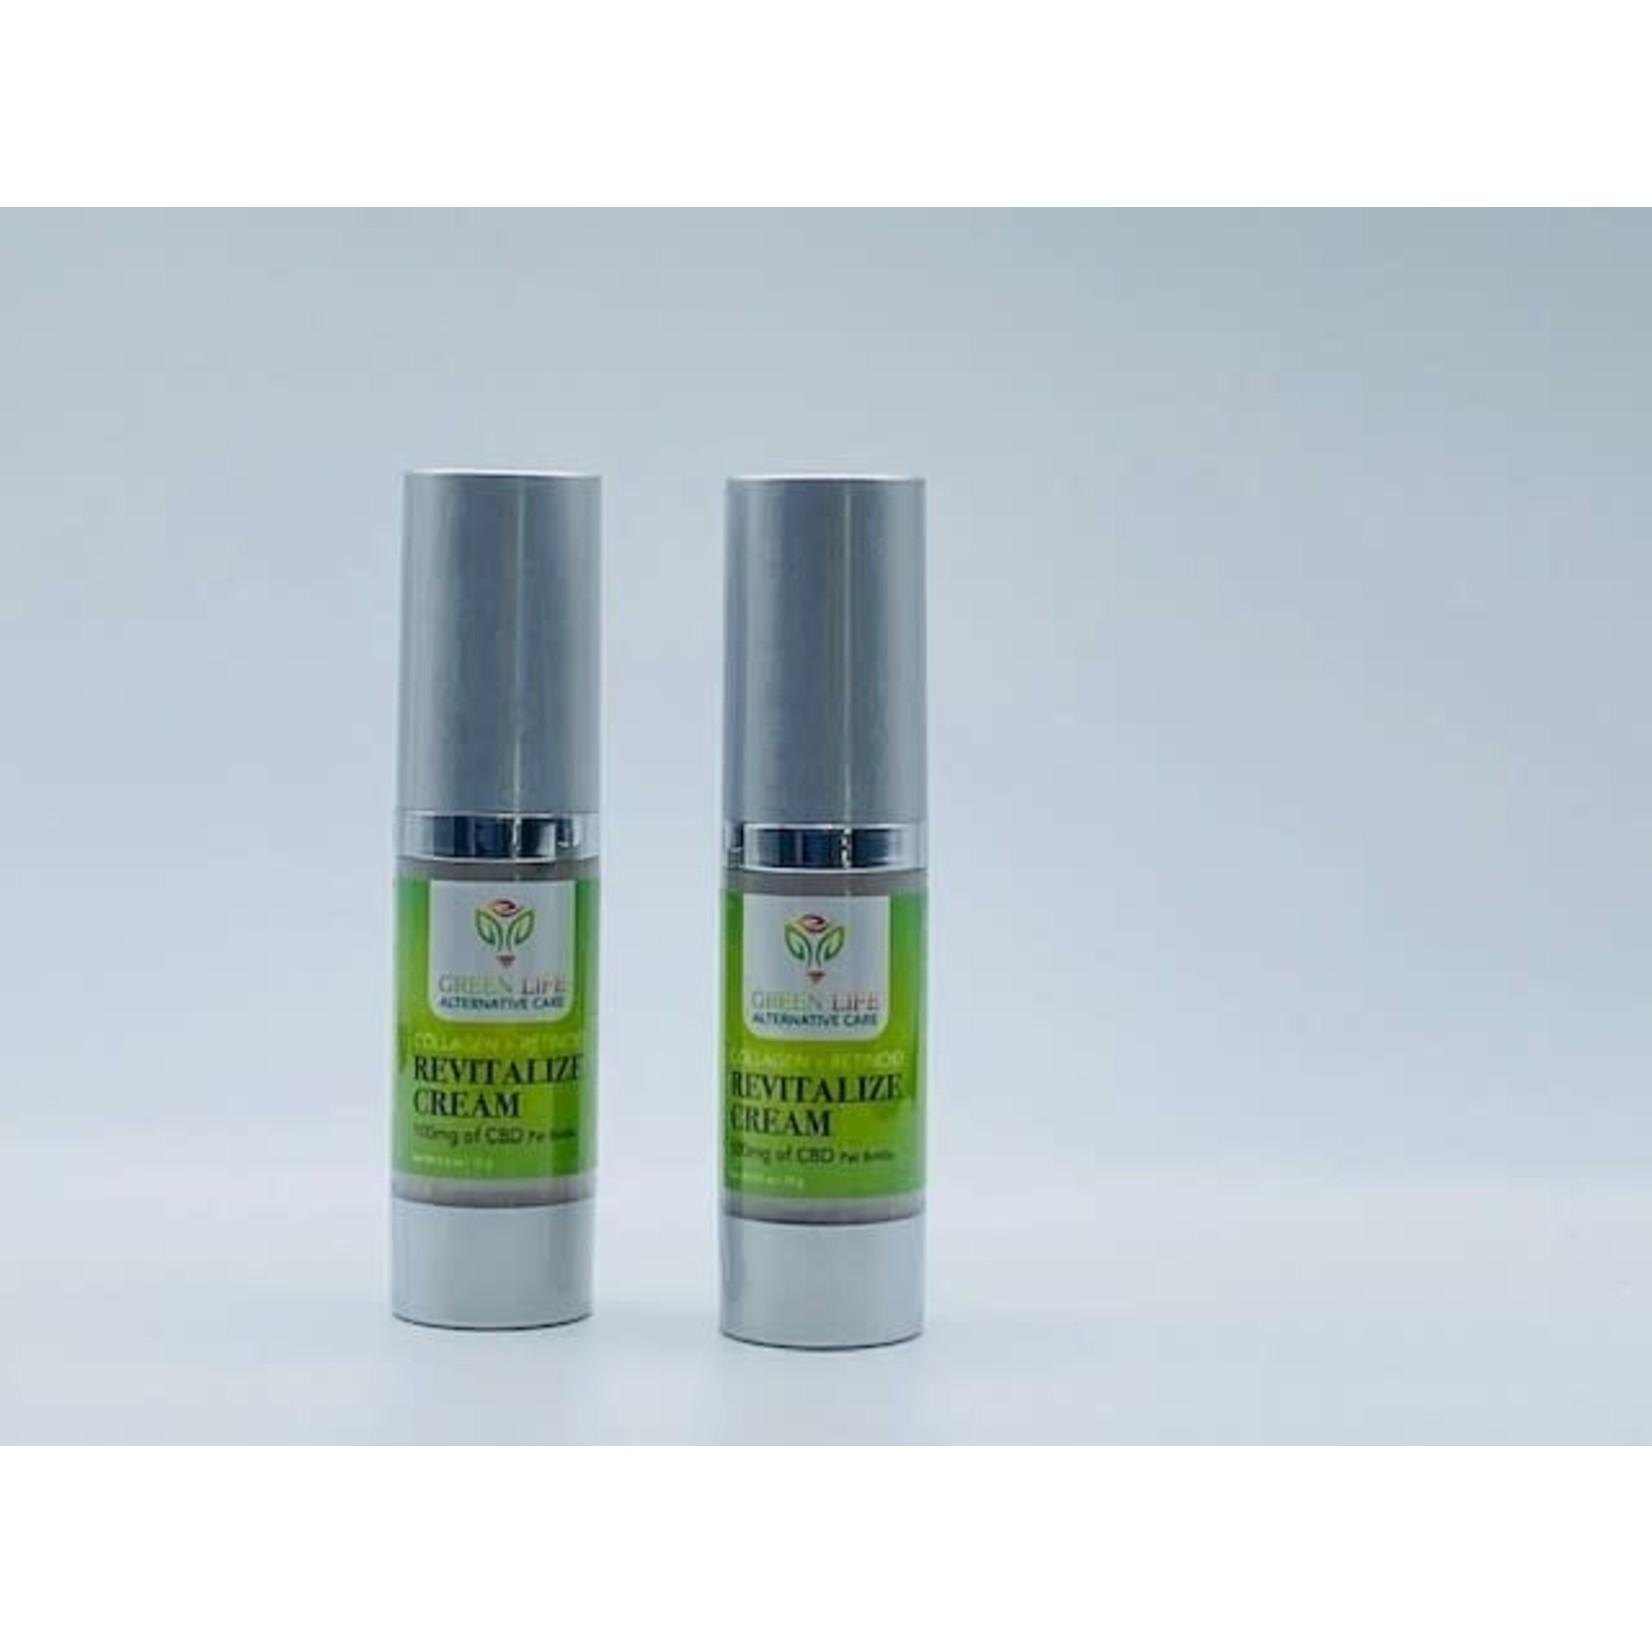 GLAC Green Life CBD Revitalizing Cream Collagen + Retinoid 100mg